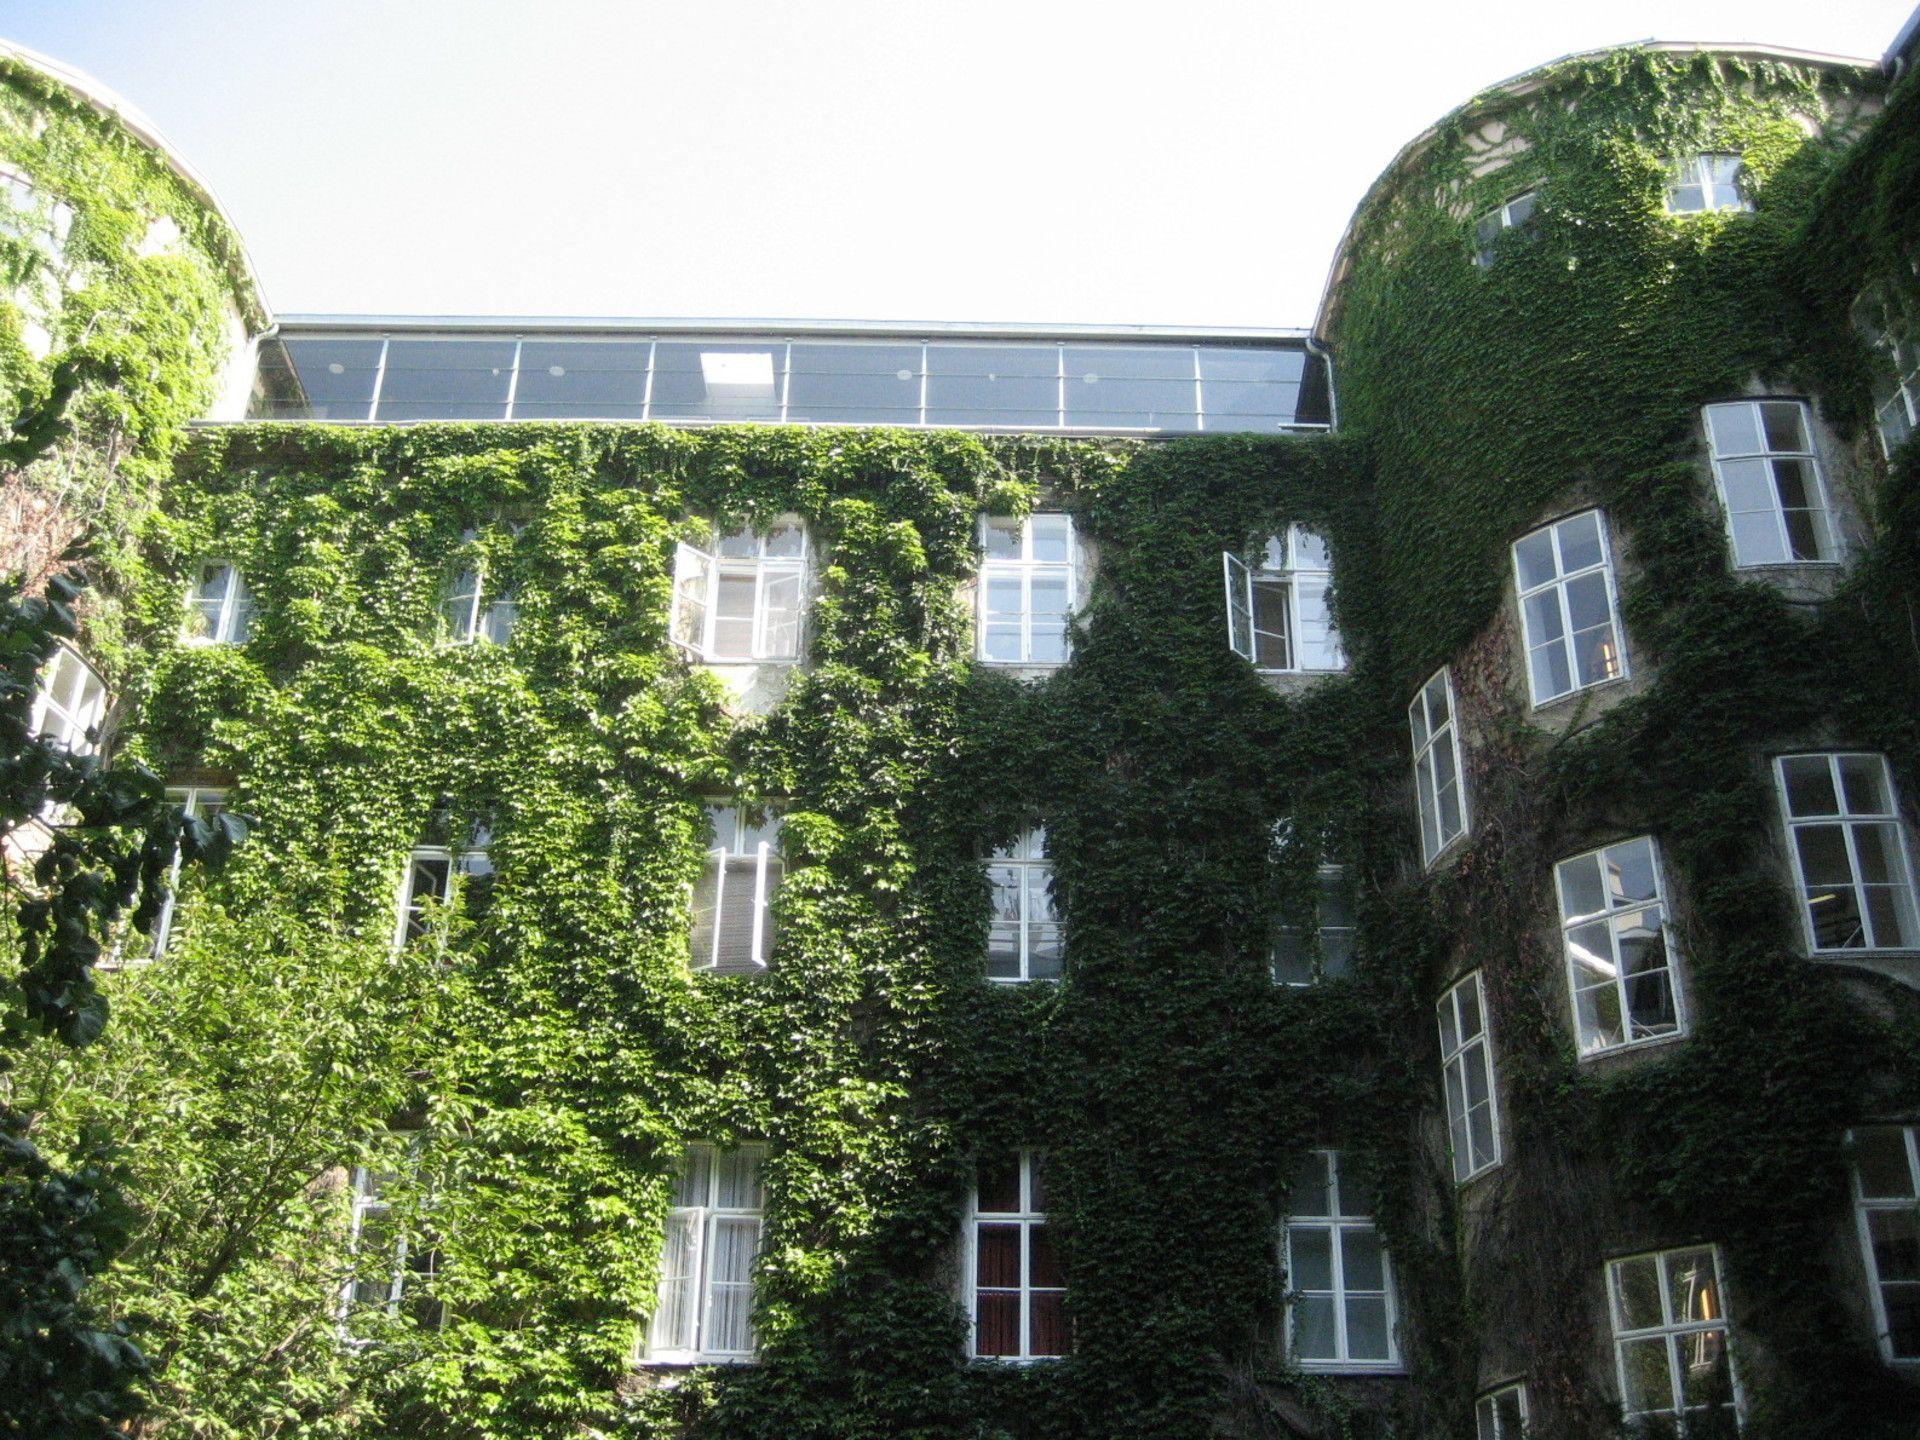 Robertgasse 1 - Roberthof, 1020 Wien